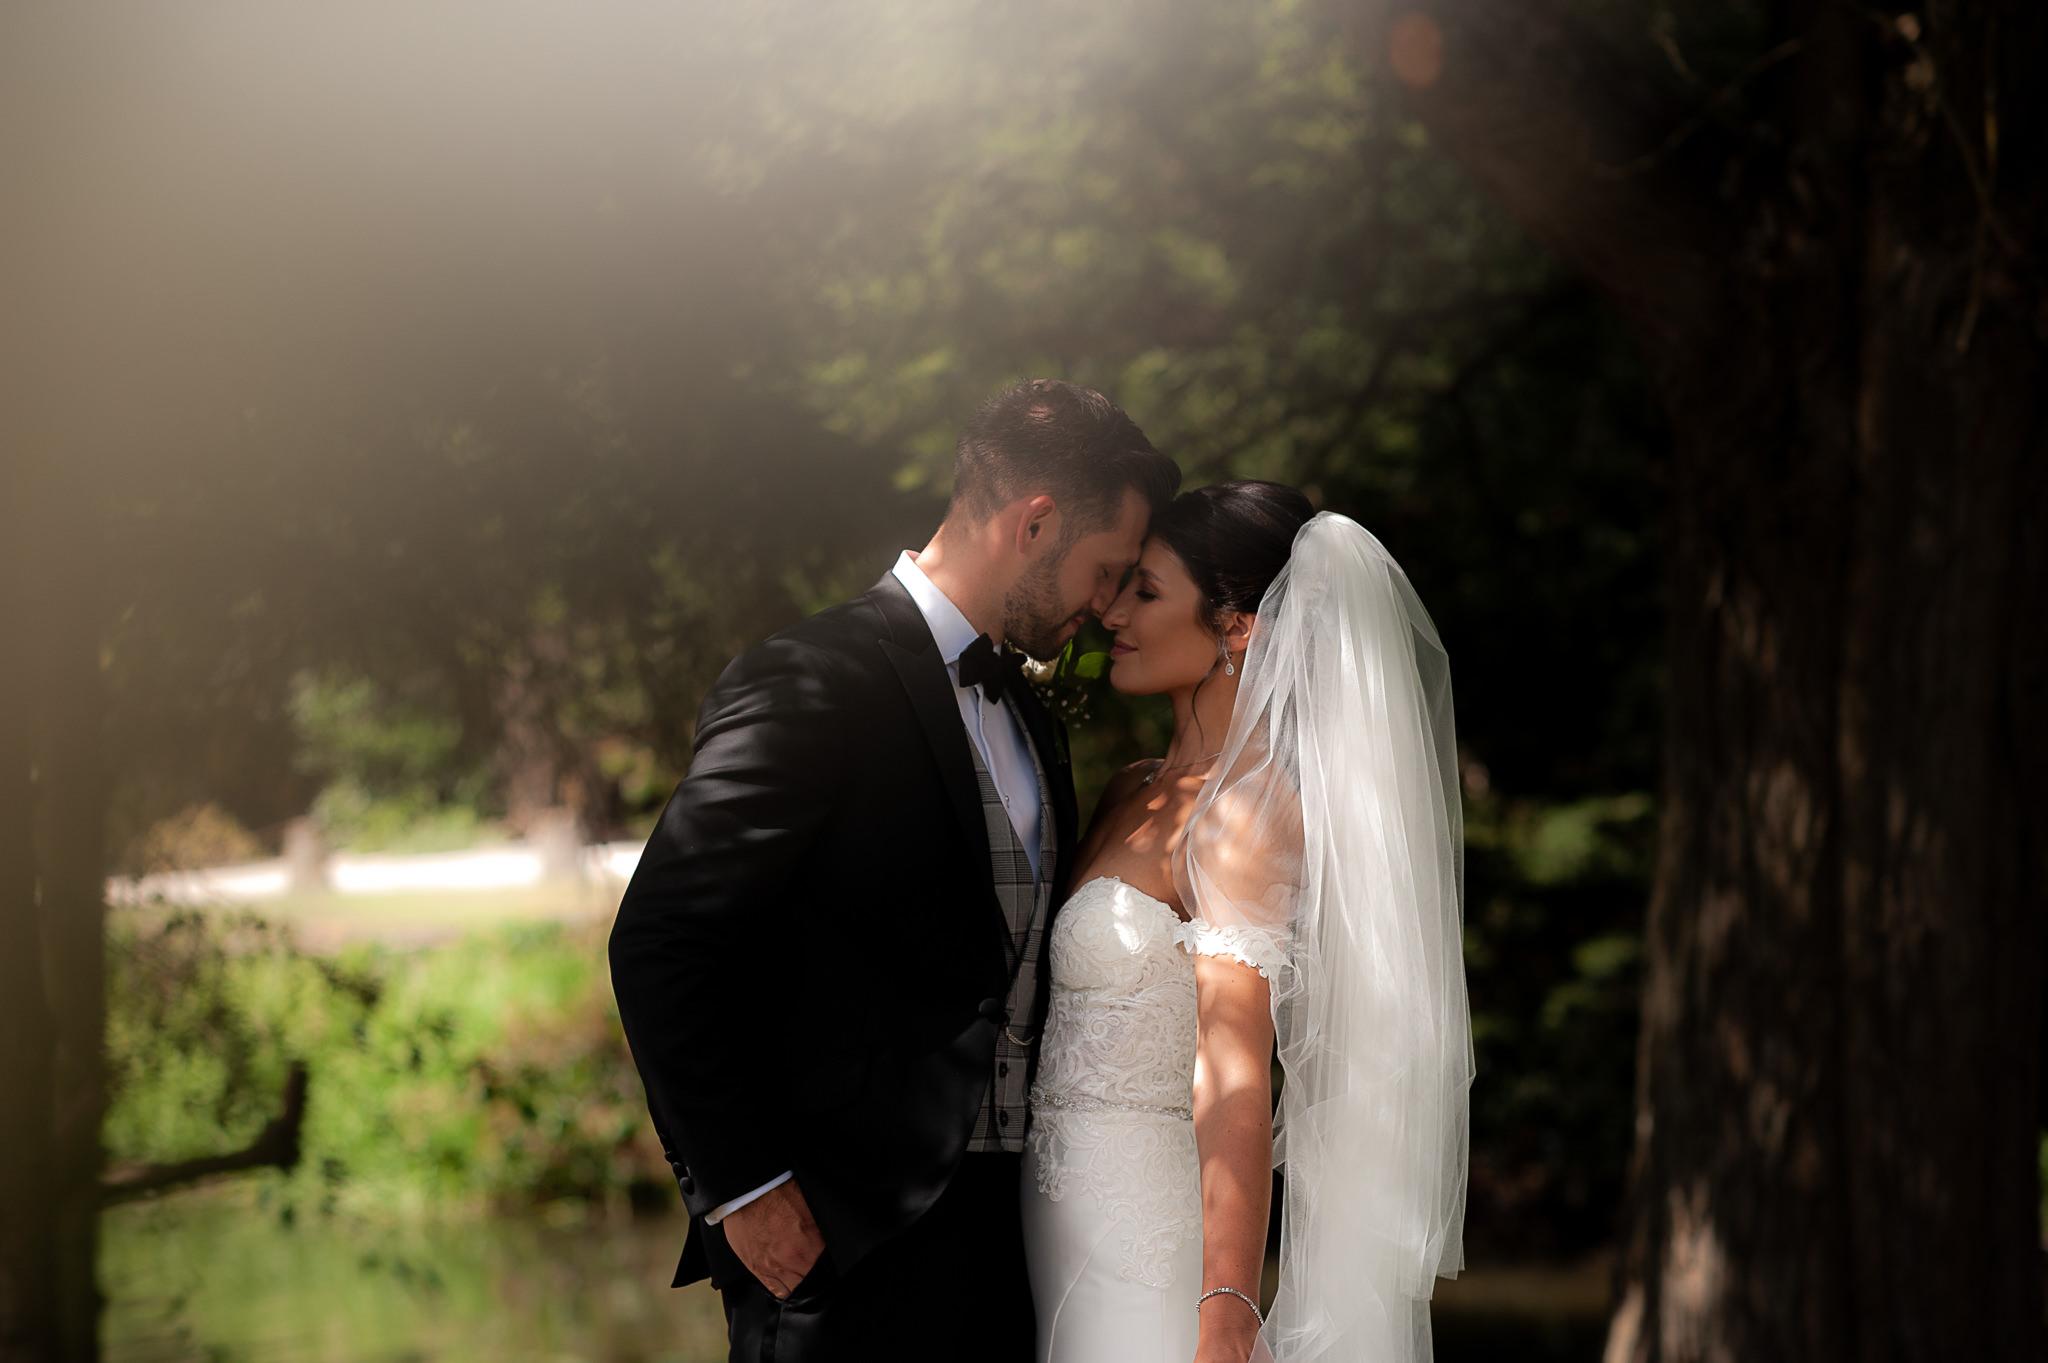 Yateley-Wedding-Photographer5.jpg